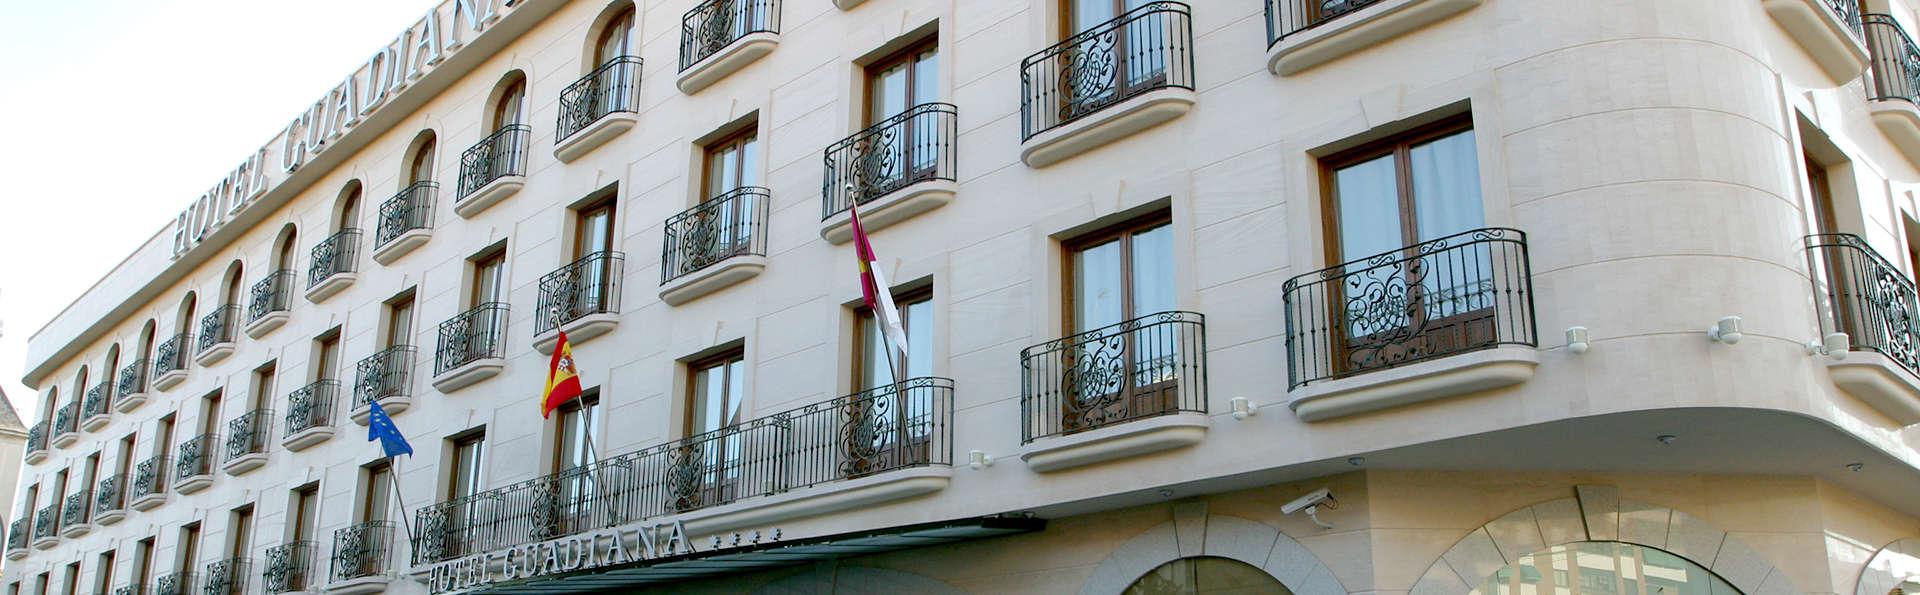 Hotel Sercotel Guadiana - Edit_Front.jpg